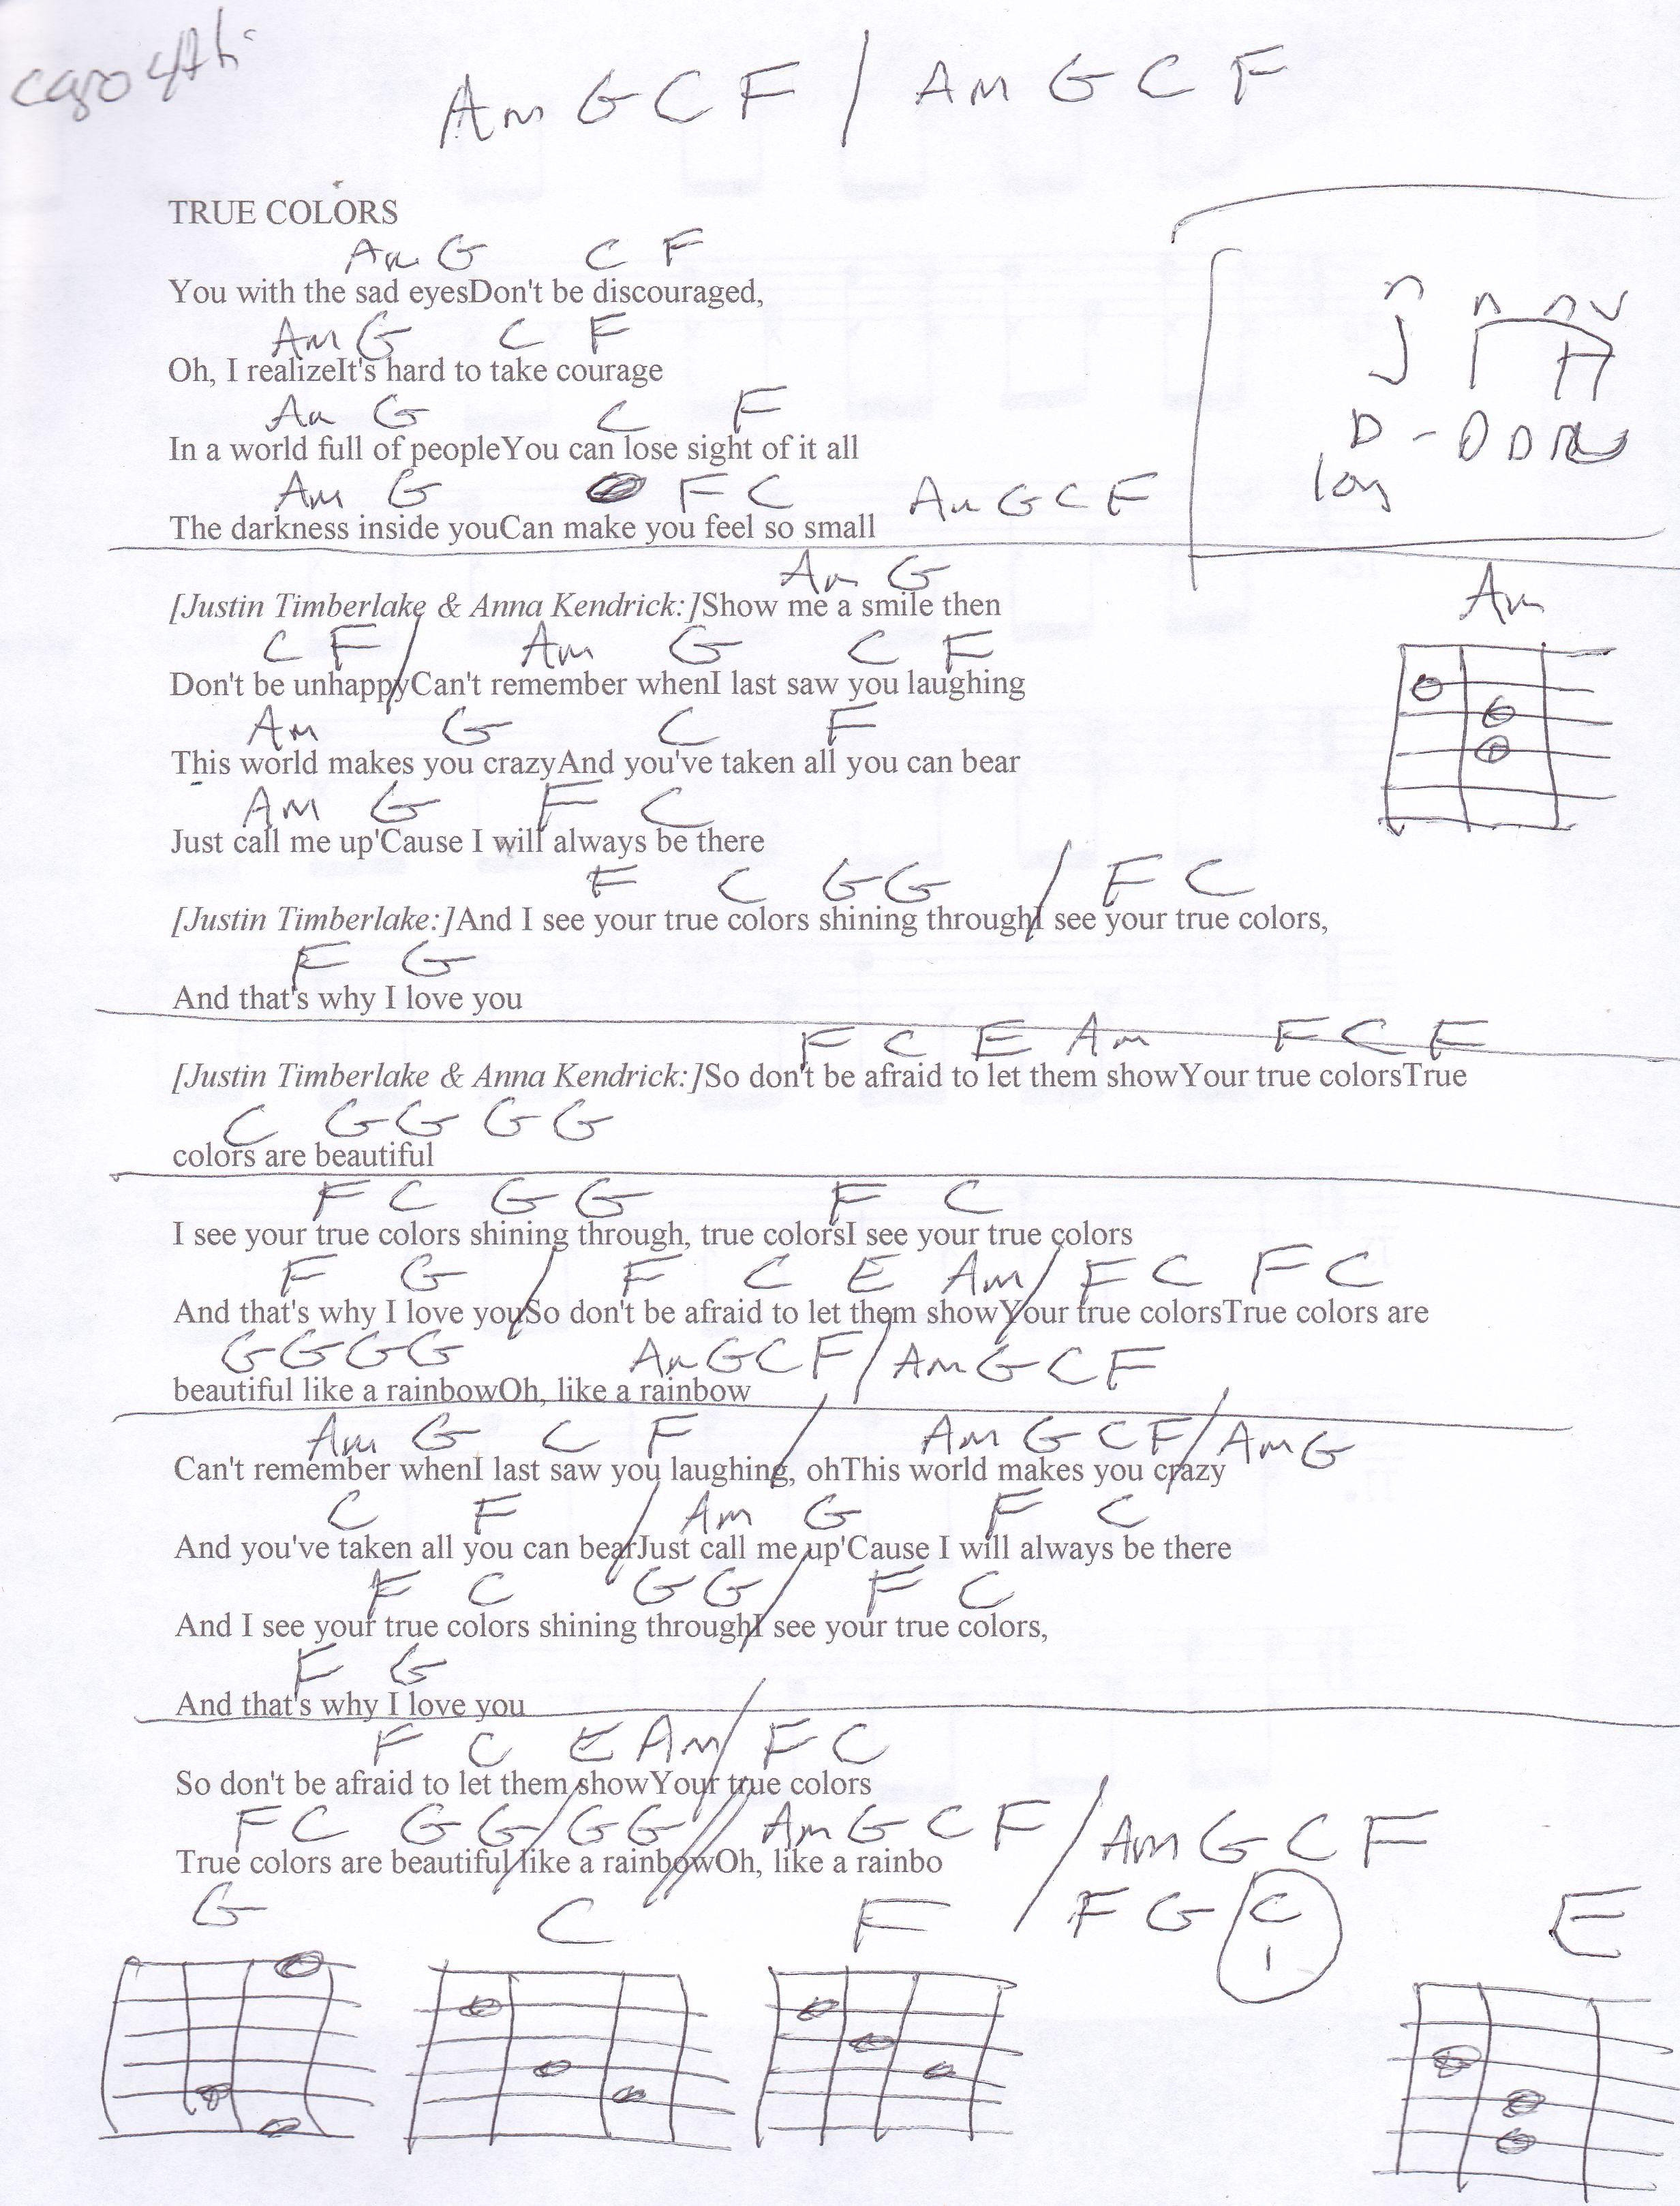 True Colors Justin Timberlake Guitar Chord Chart Capo 4th